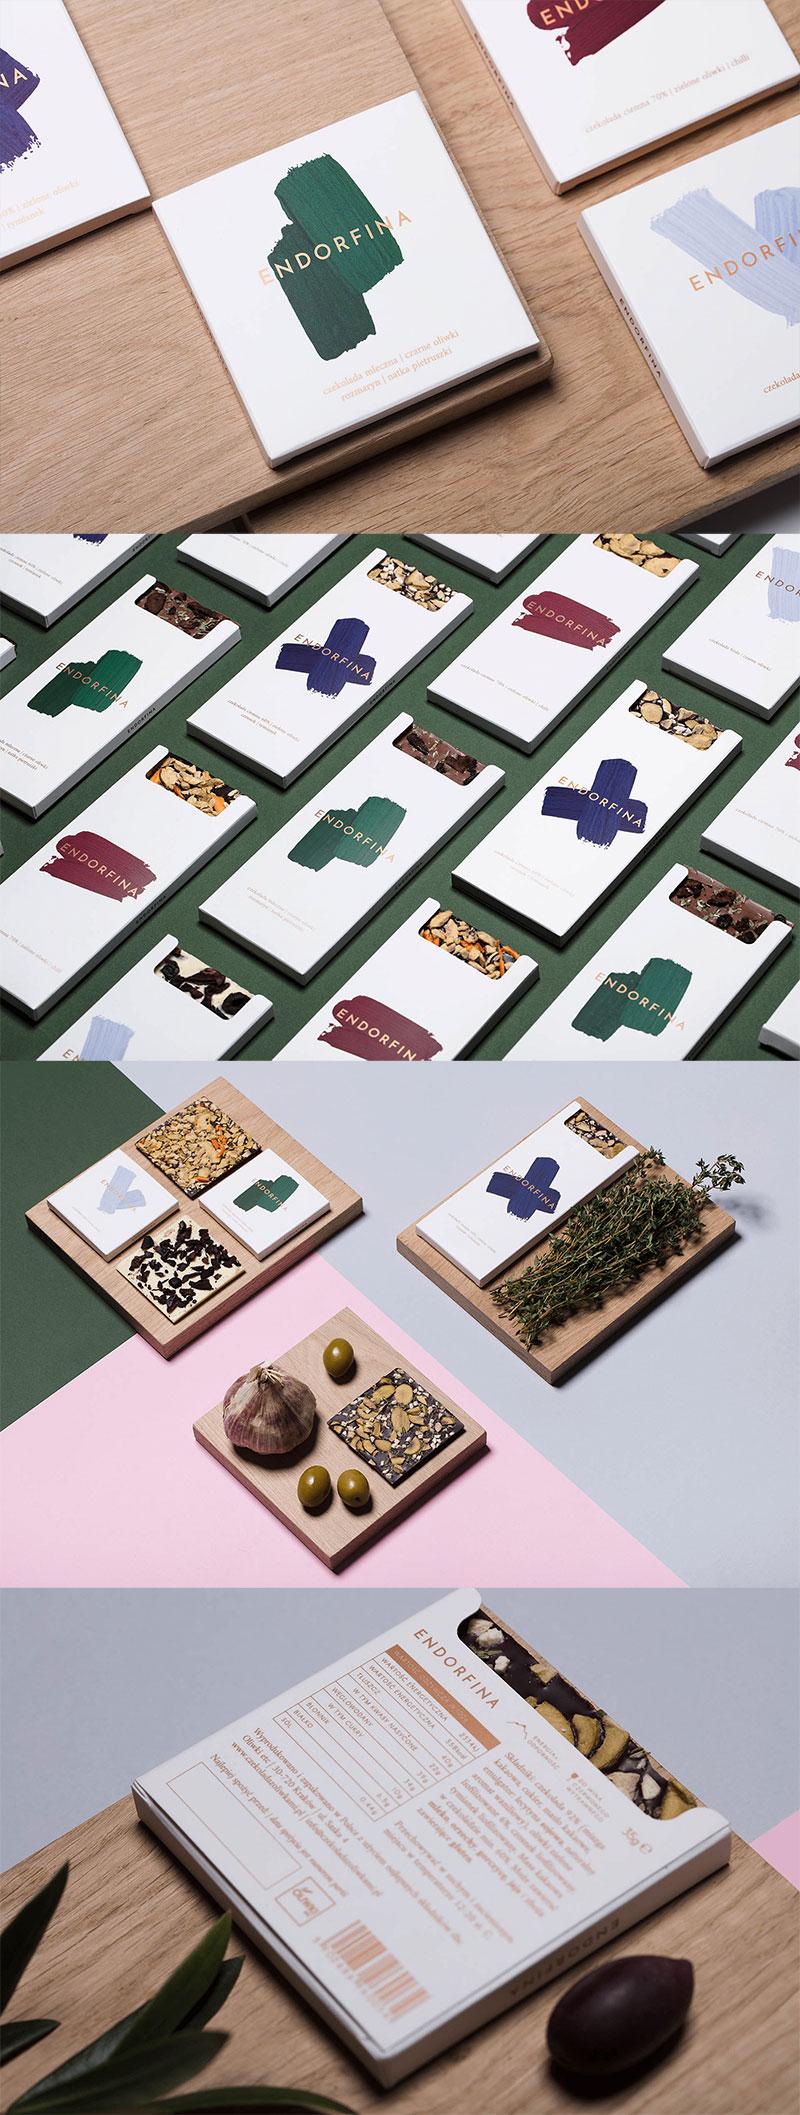 Endorfina Chocolate Branding & Packaging